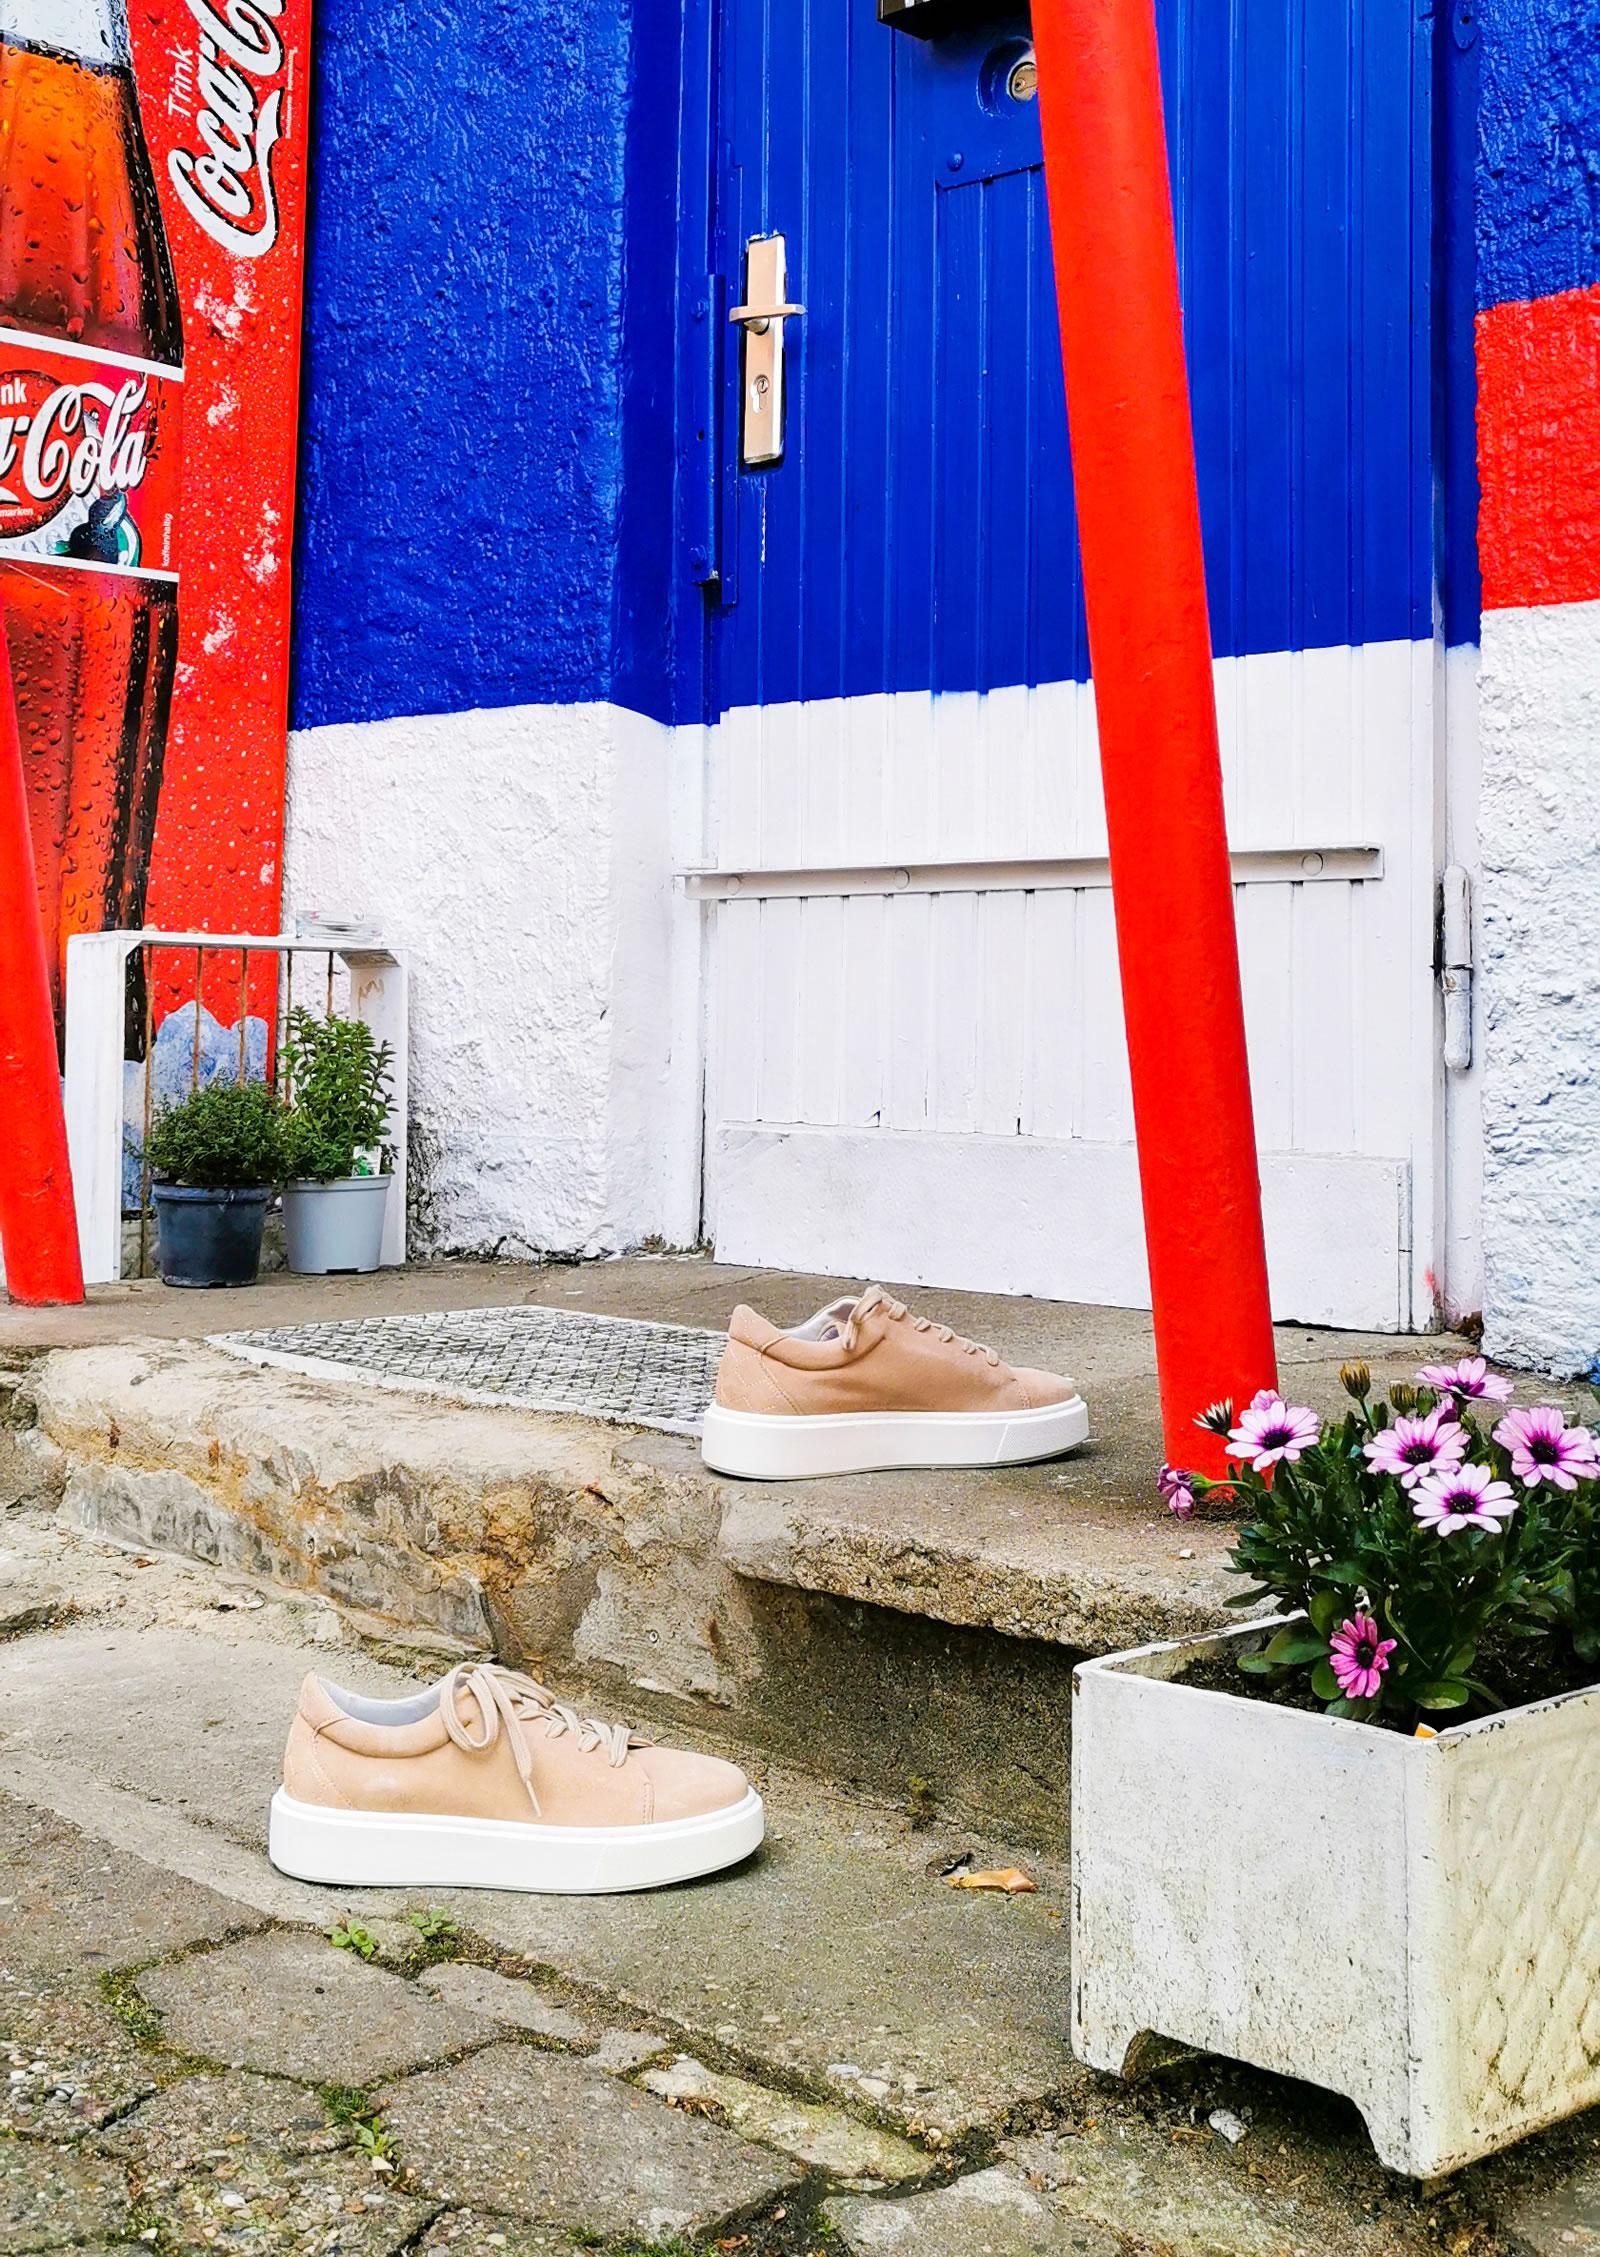 Post Exchange Ledersneaker sand 99,- €